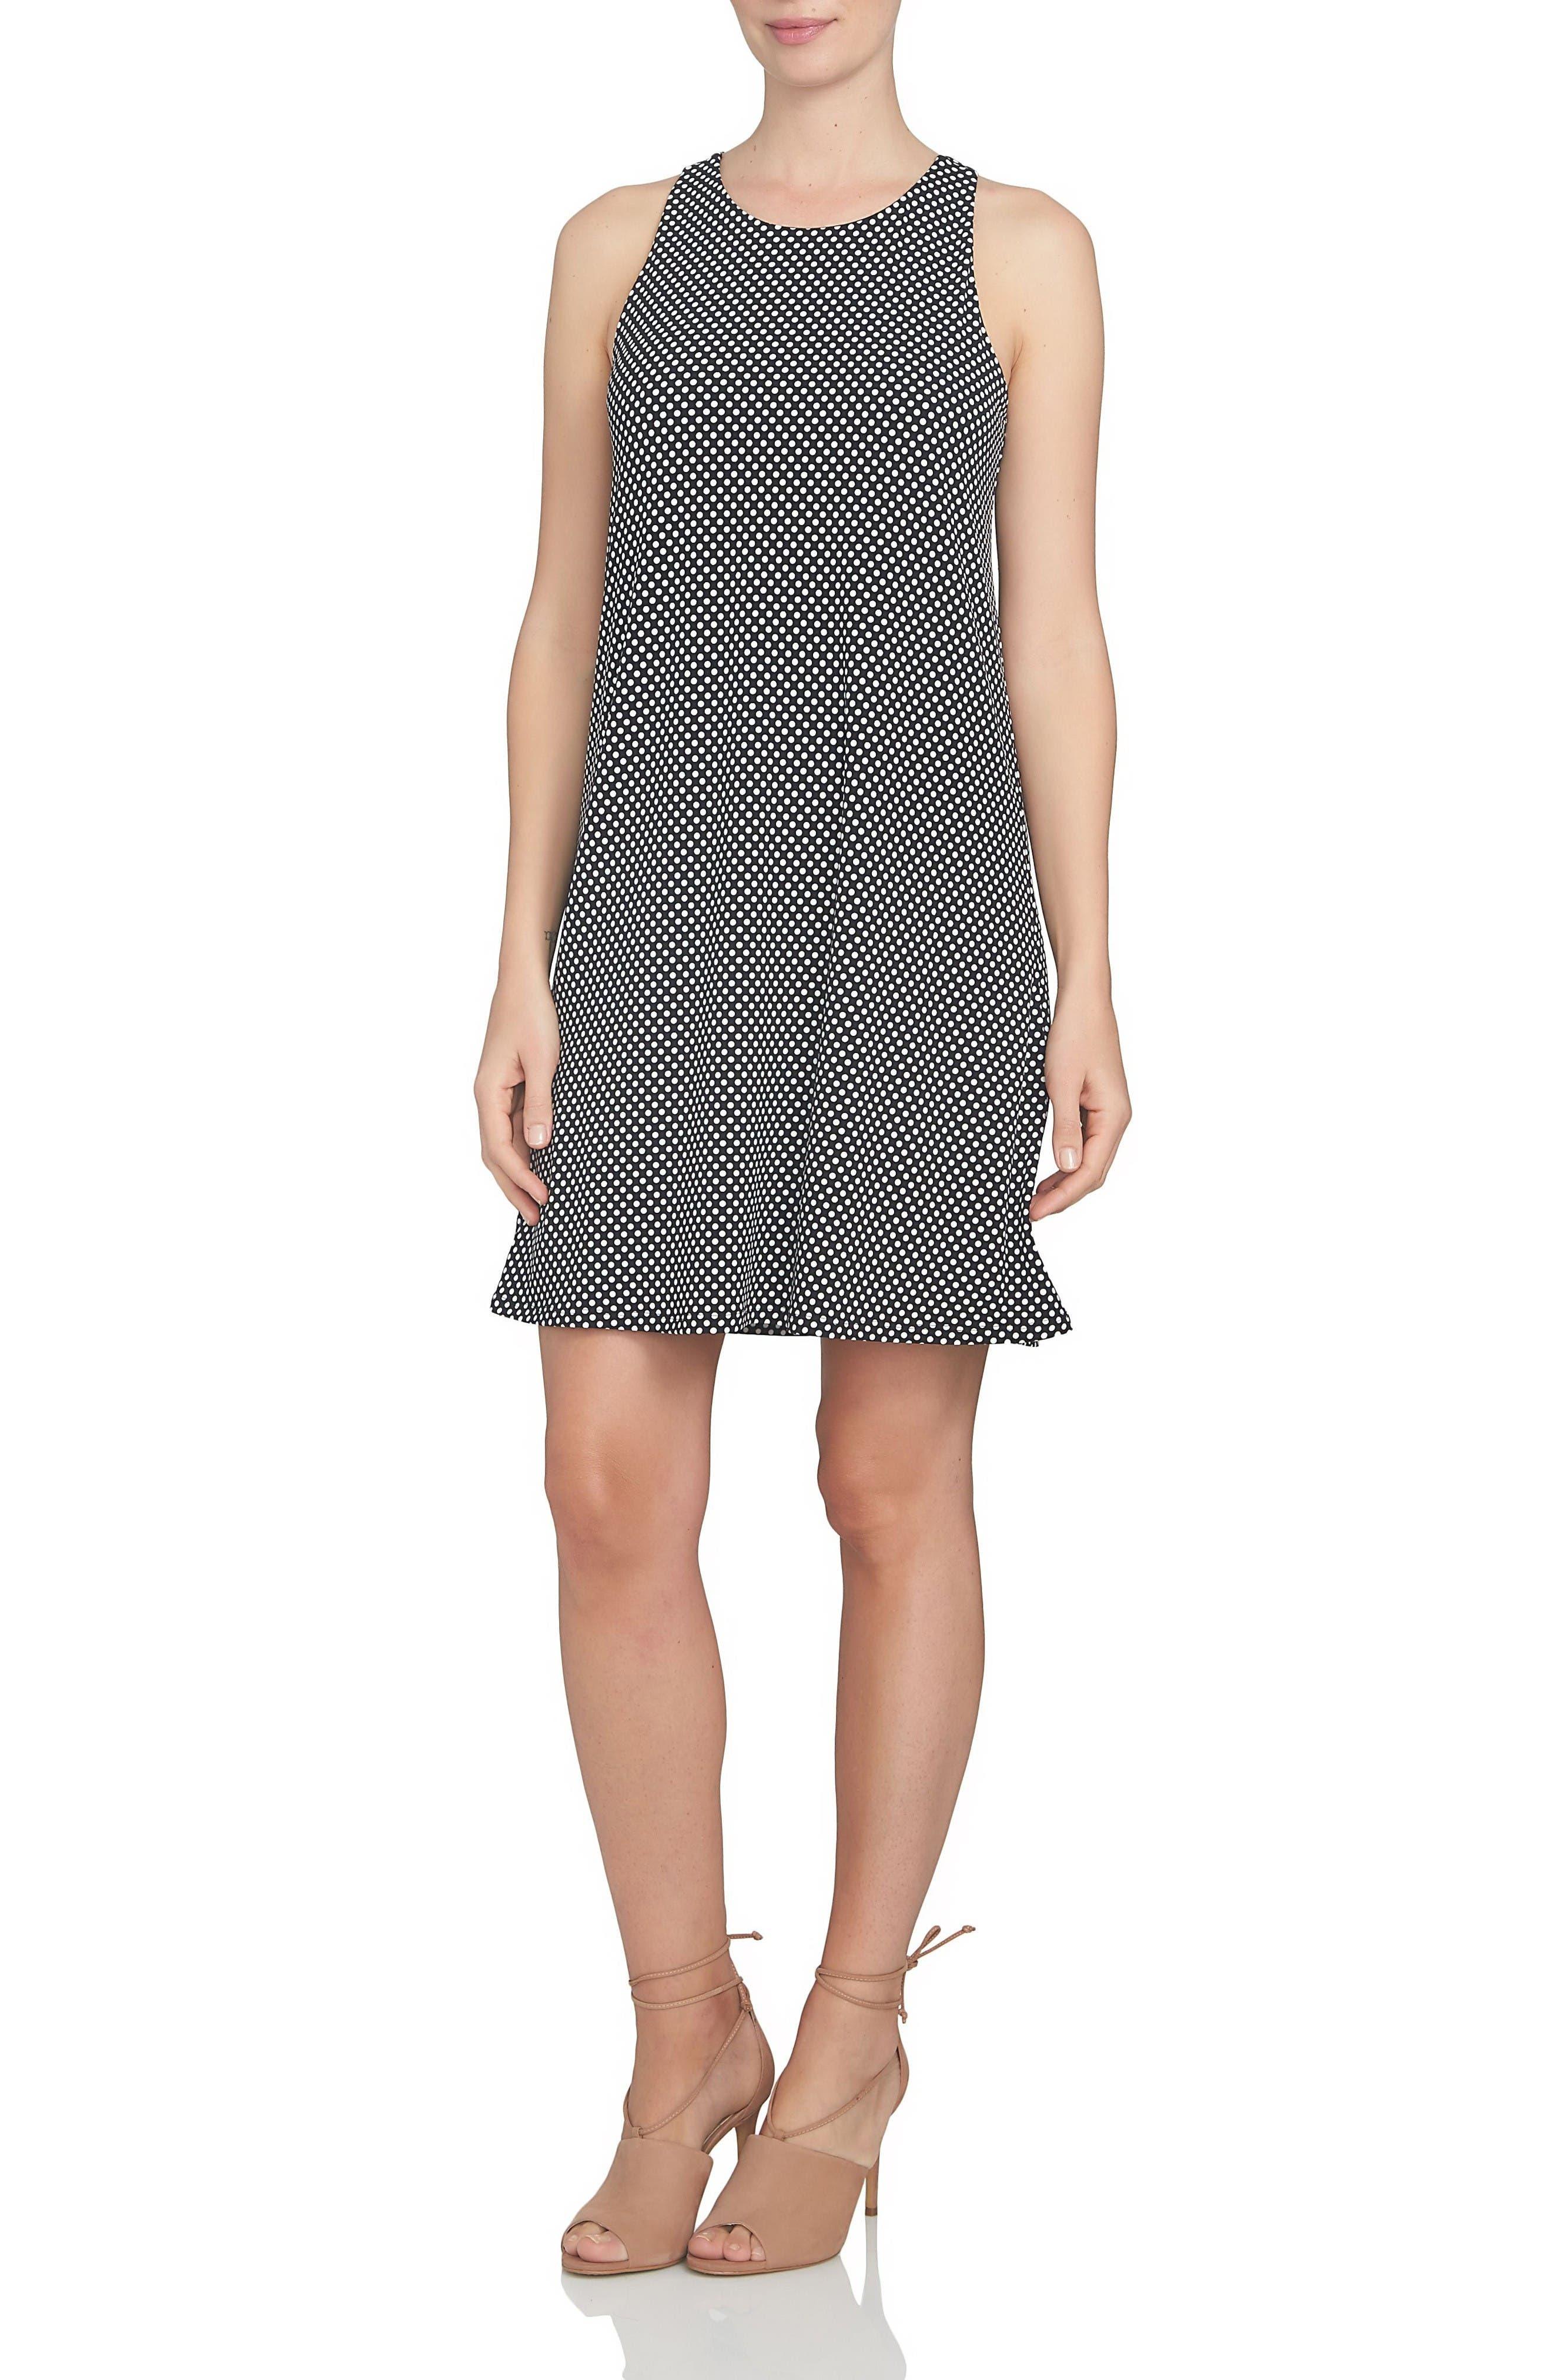 Alternate Image 1 Selected - CeCe Polka Dot Twist Back Knit Shift Dress